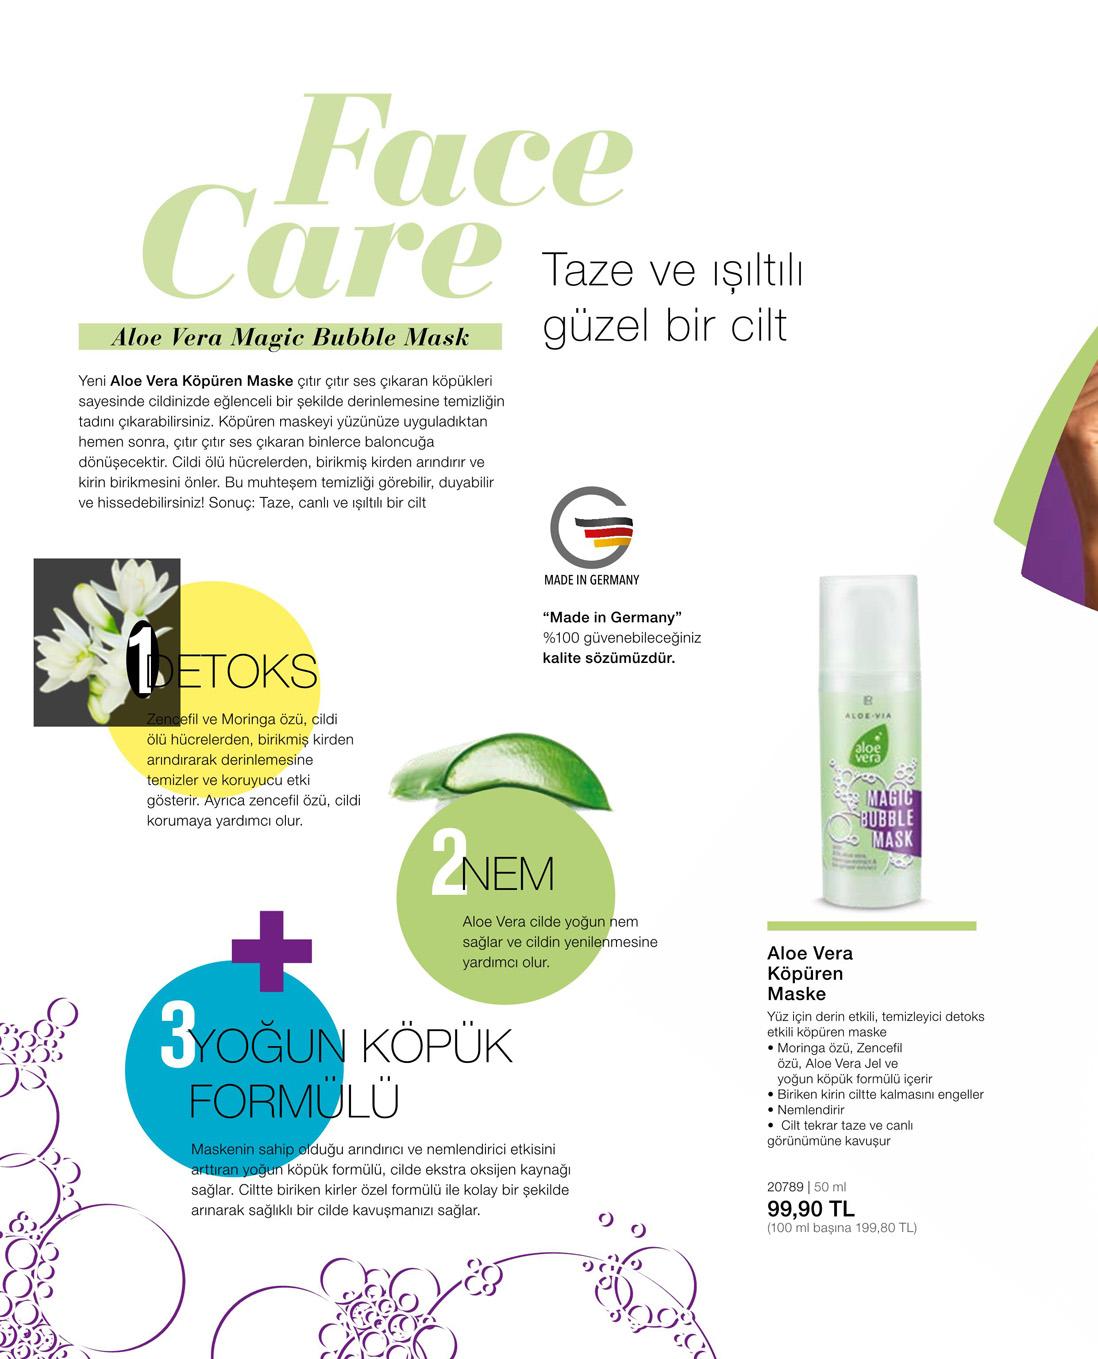 LR Aloe Vera Köpüren Maske katalog